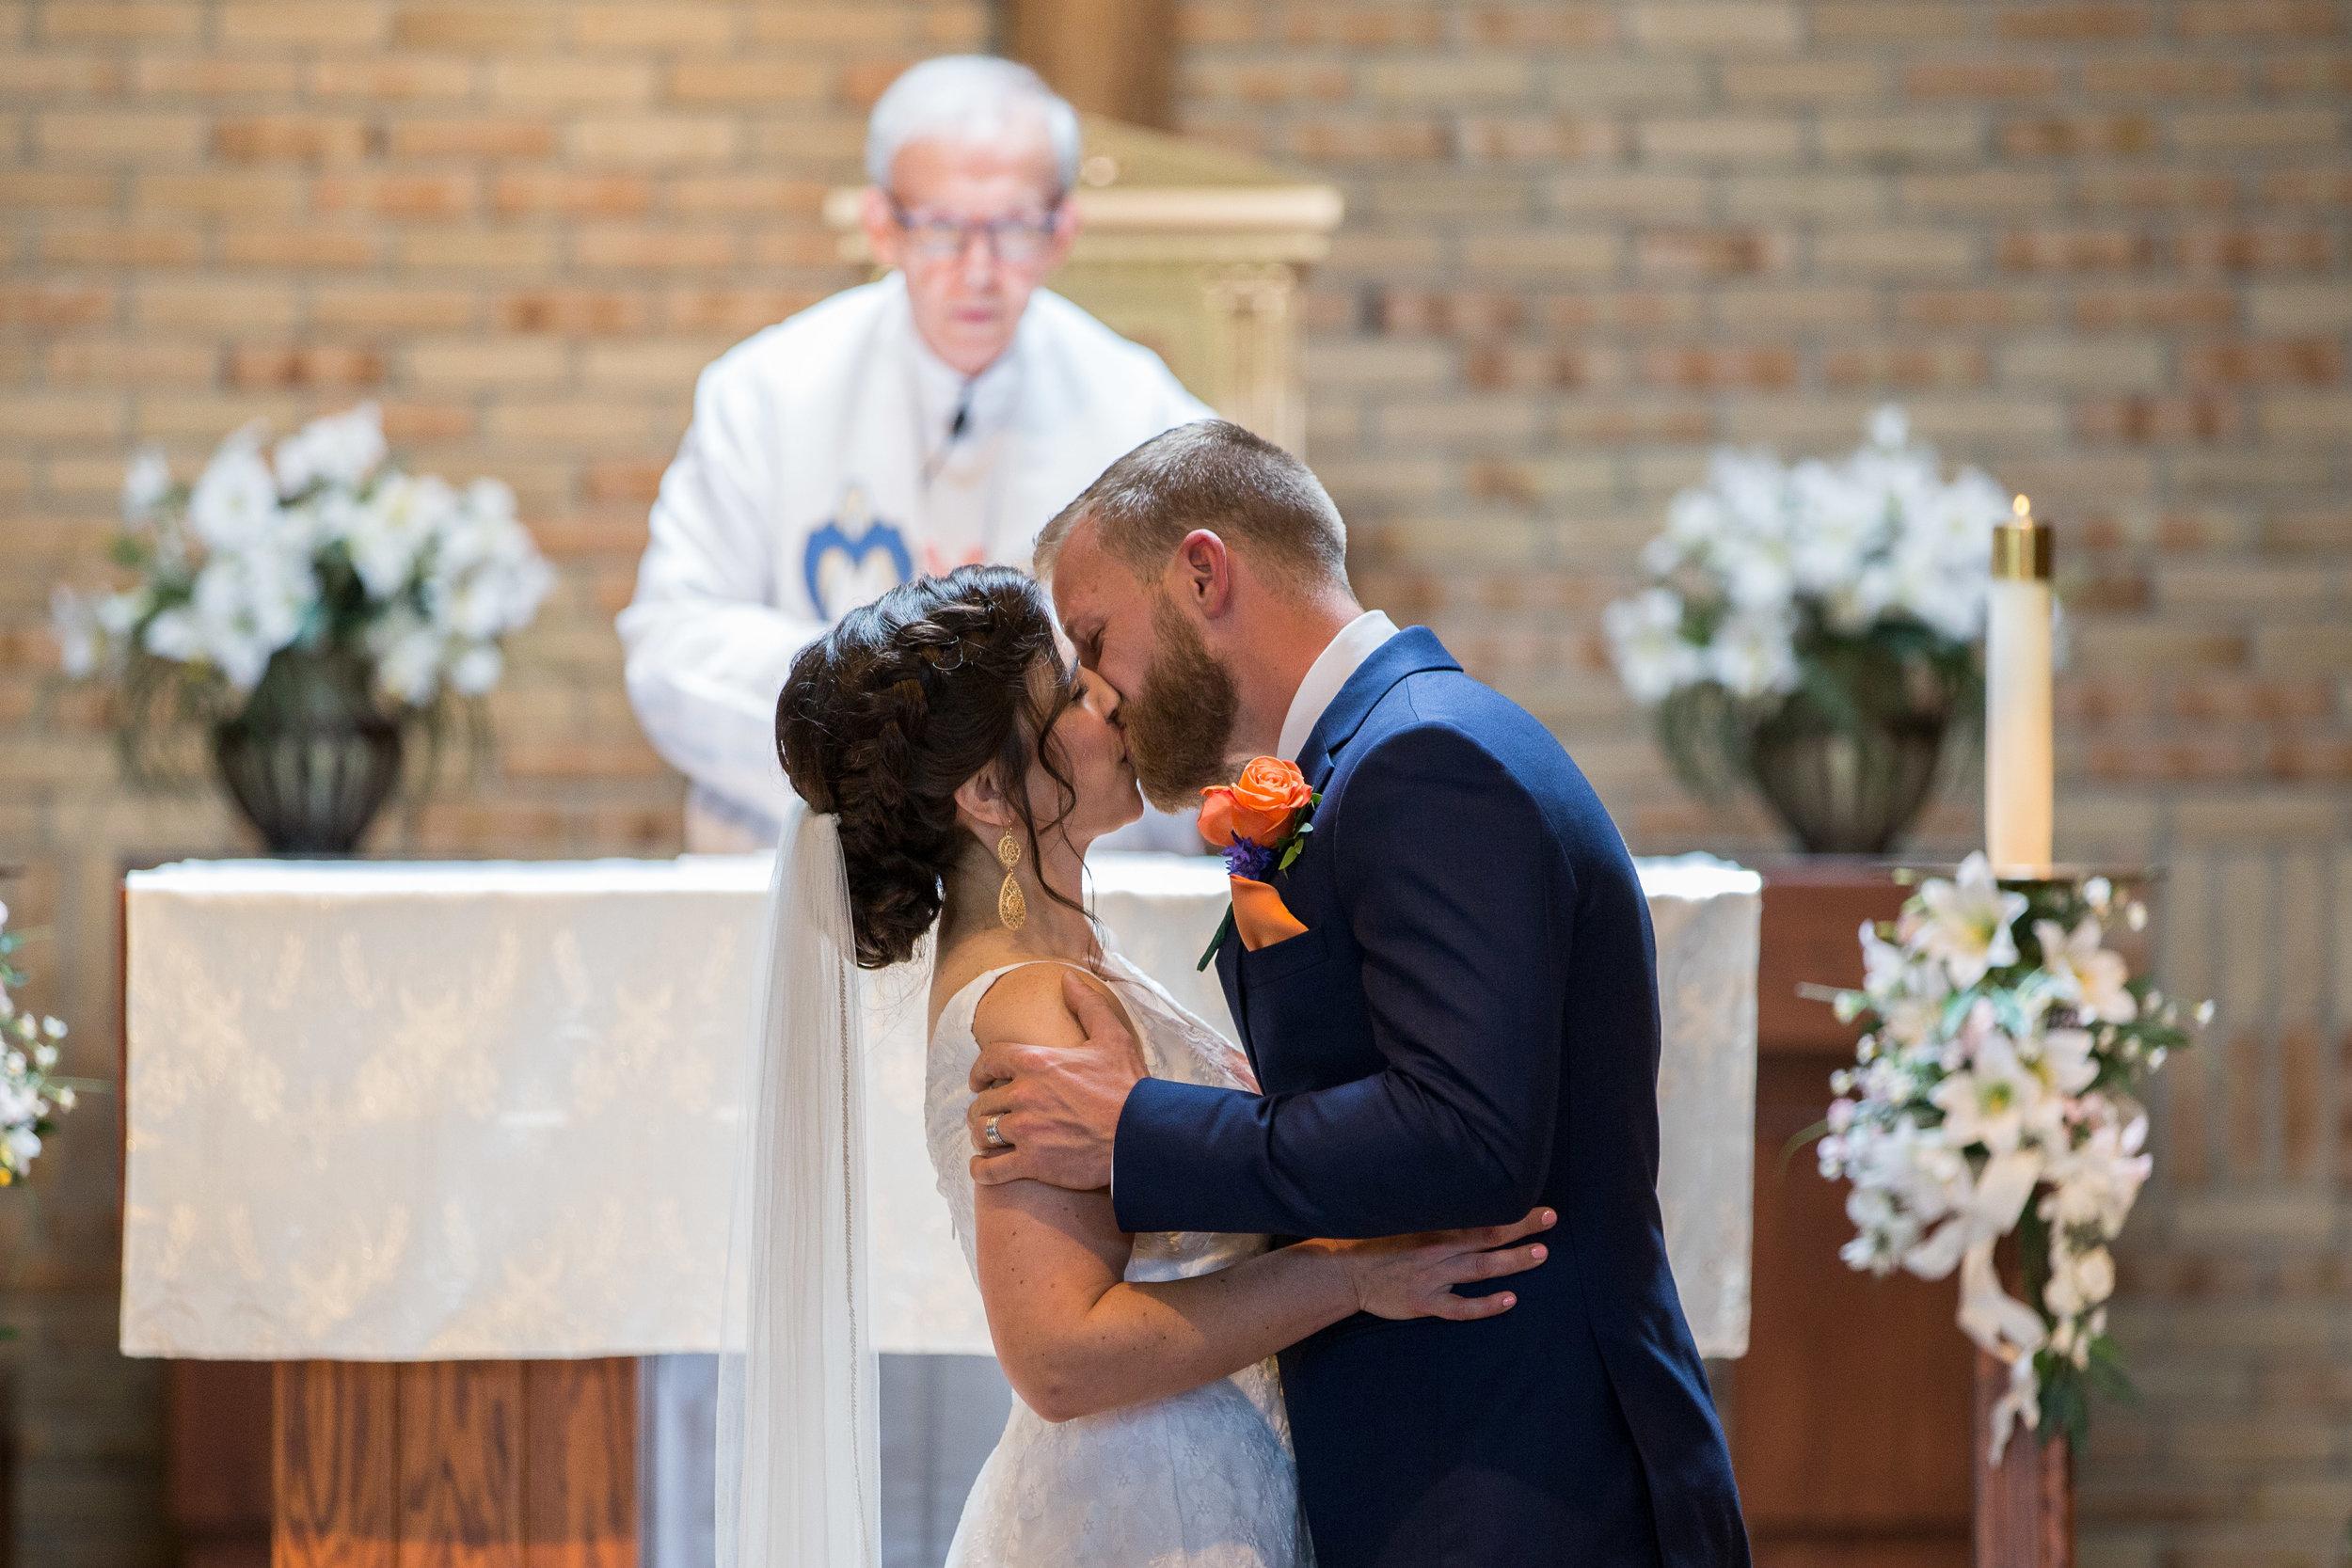 Natalie and Dallas Mooney Wedding 6-8-19_Tania Watt Photography-142.jpg